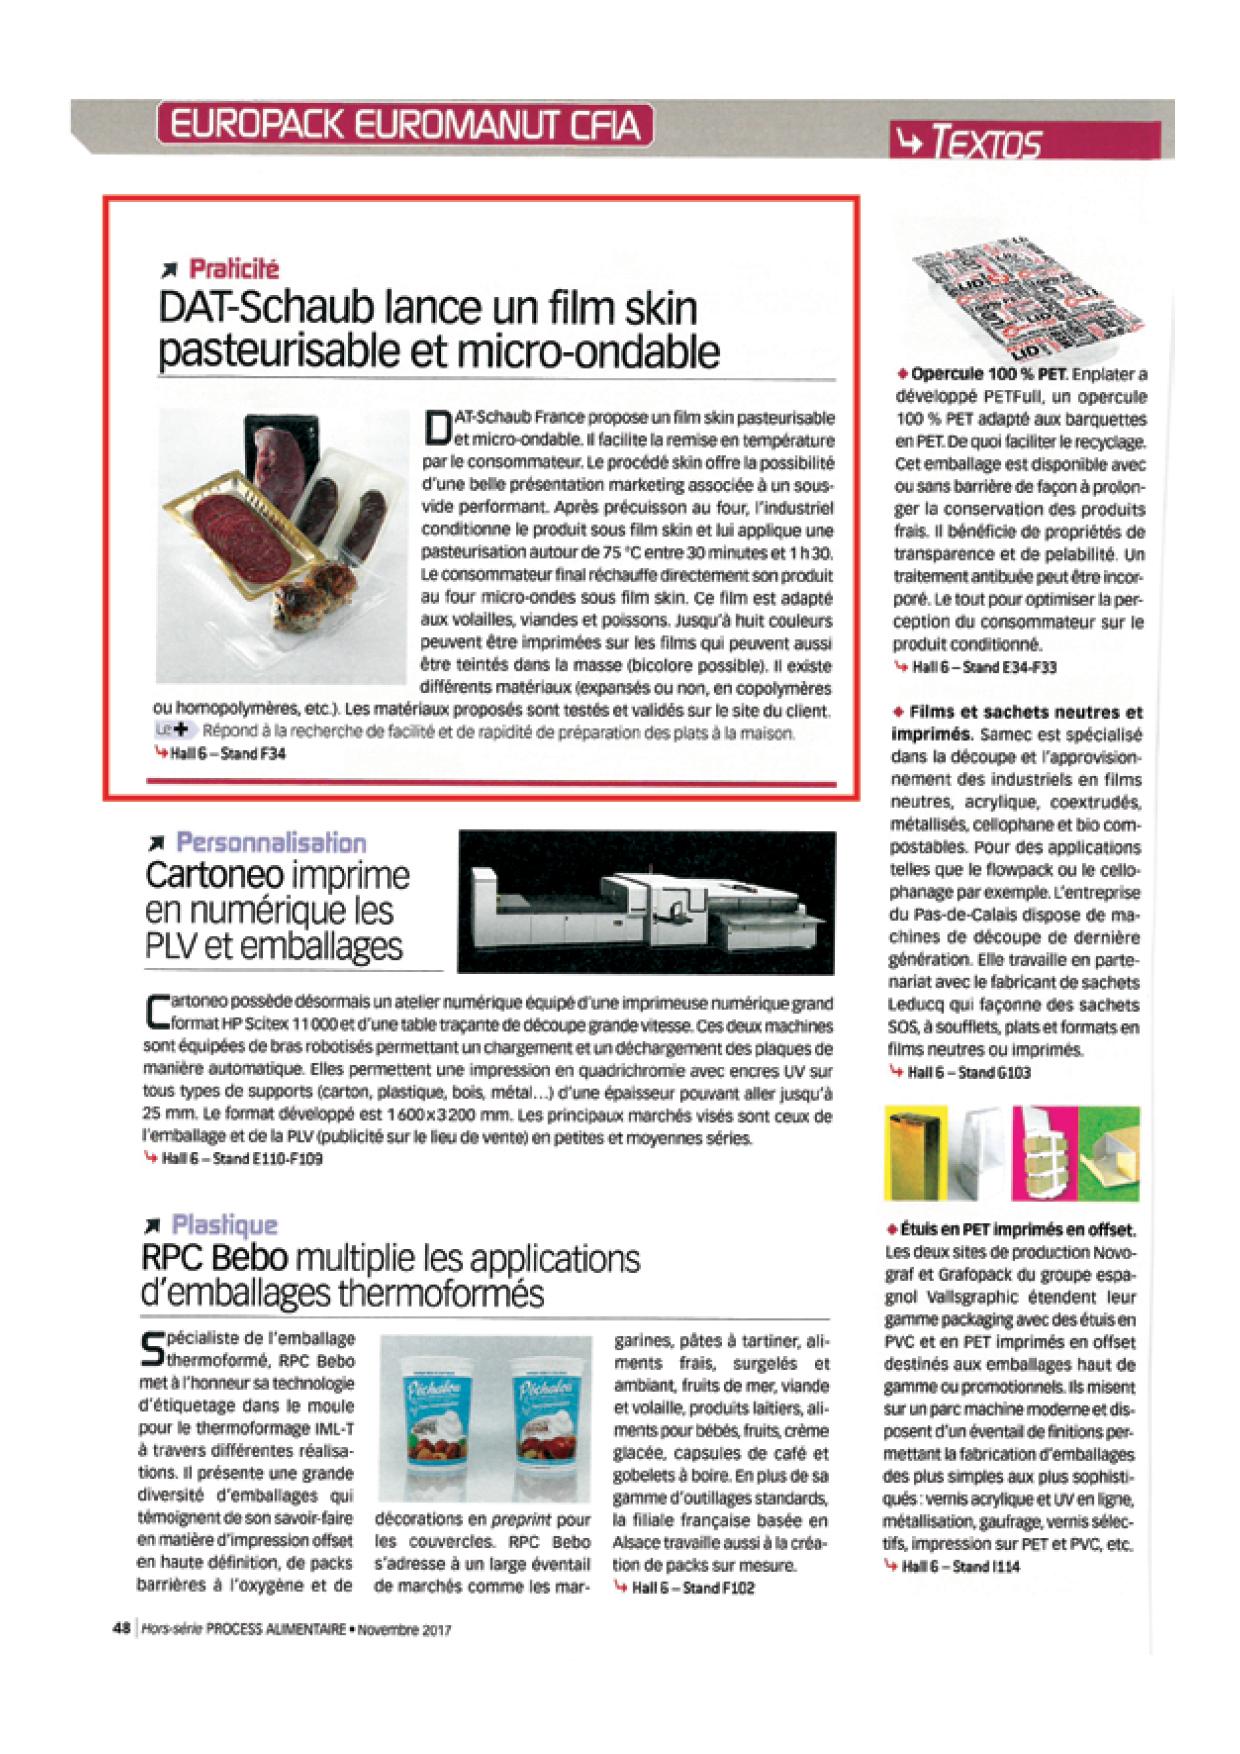 PROCESS HORS SERIE EUROPACK EUROMANUT - Novembre 2017 - 3 articles produits emballages3